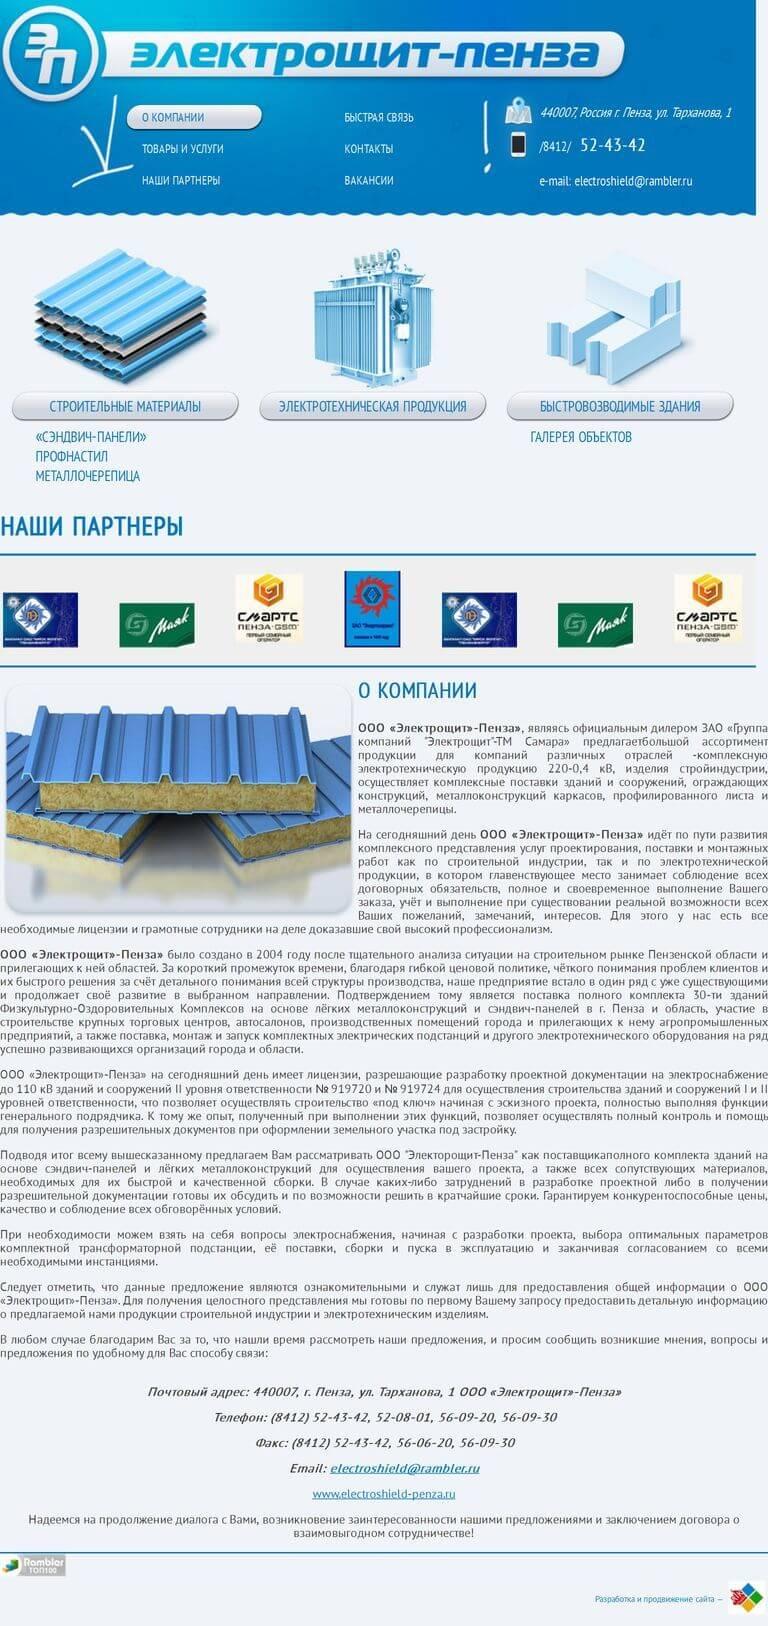 electroshield-penza.ru